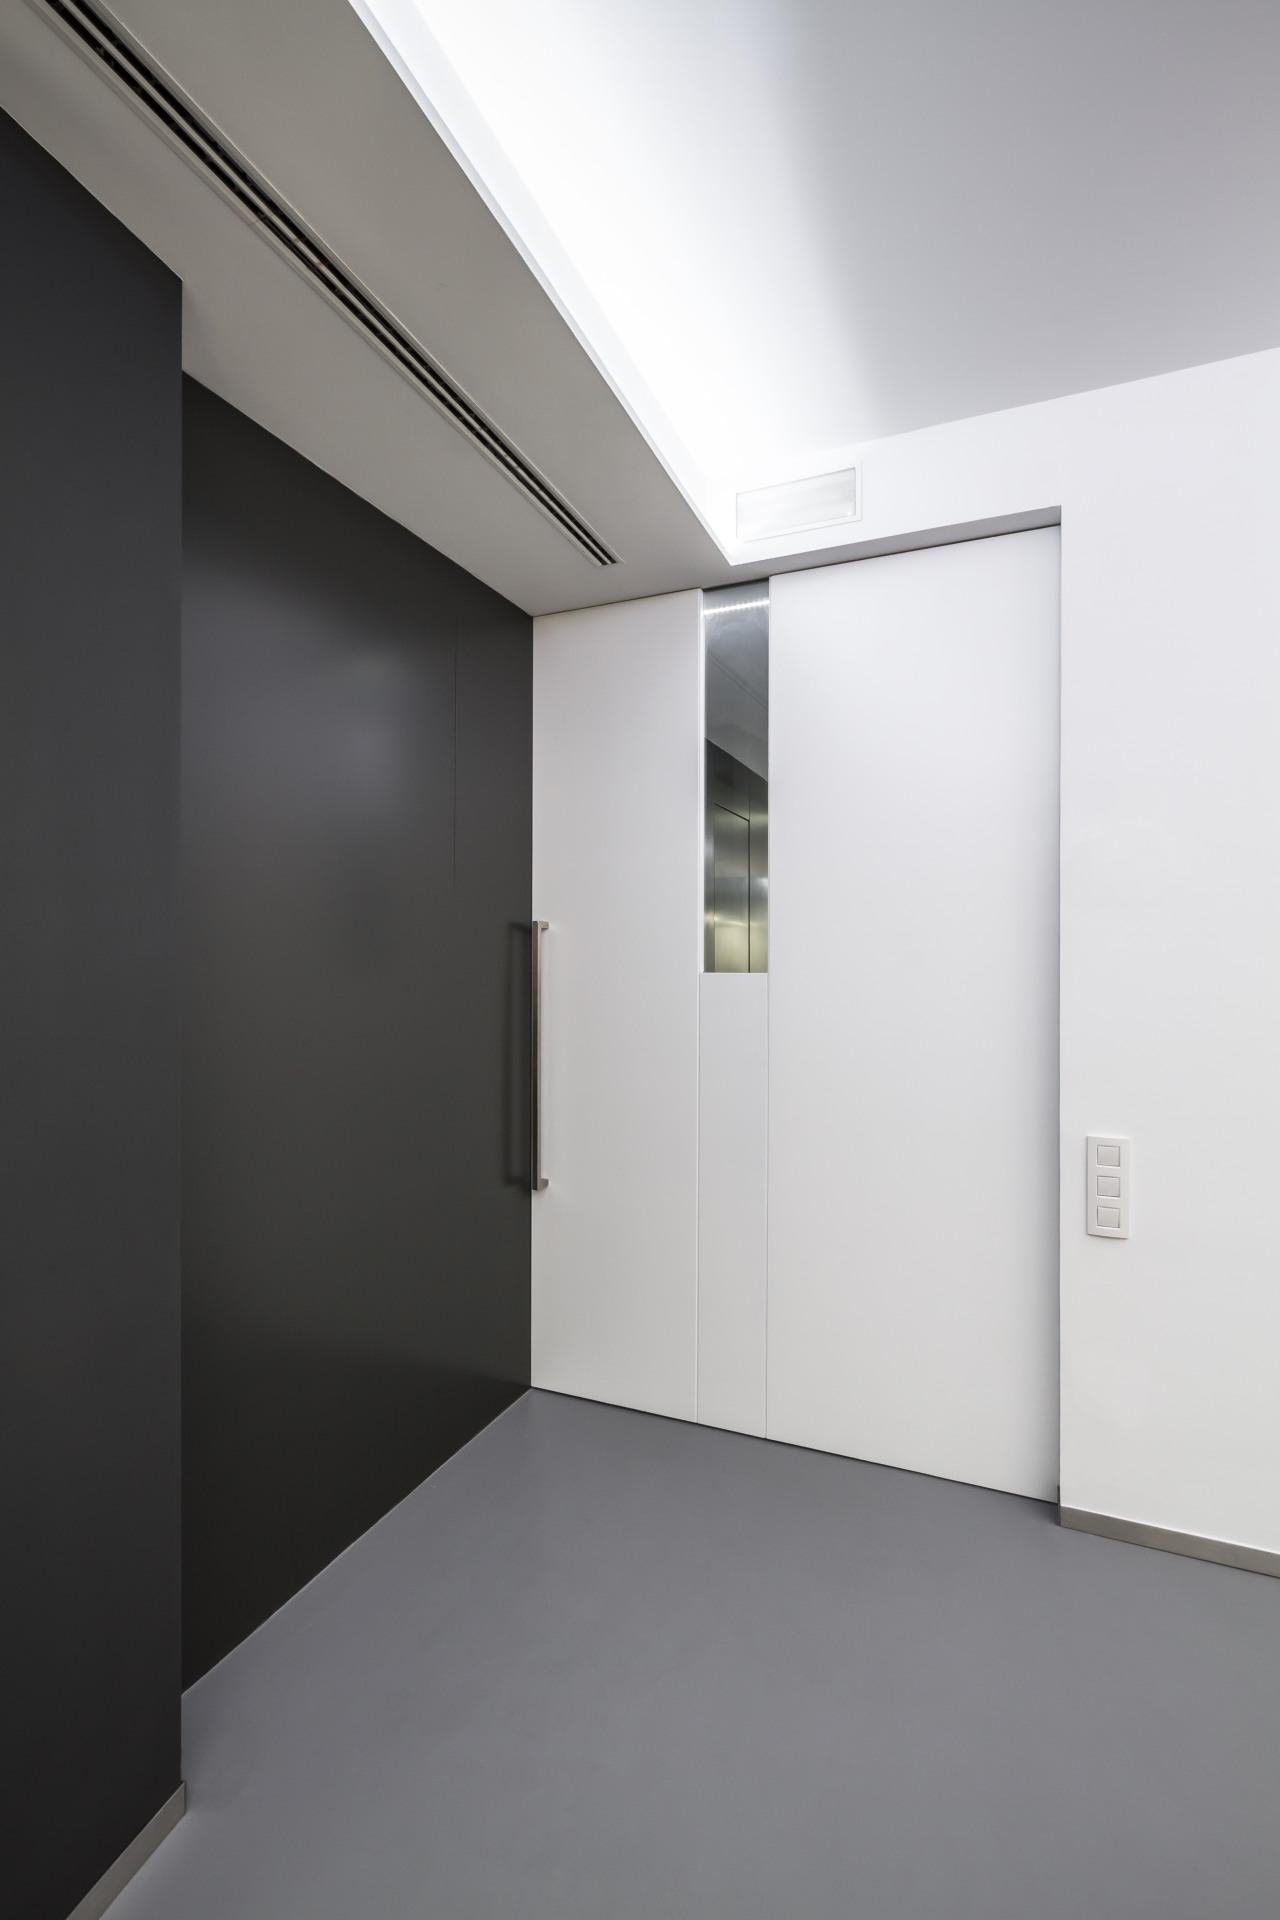 fotografia-arquitectura-valencia-german-cabo-hernandez-clinica (7)